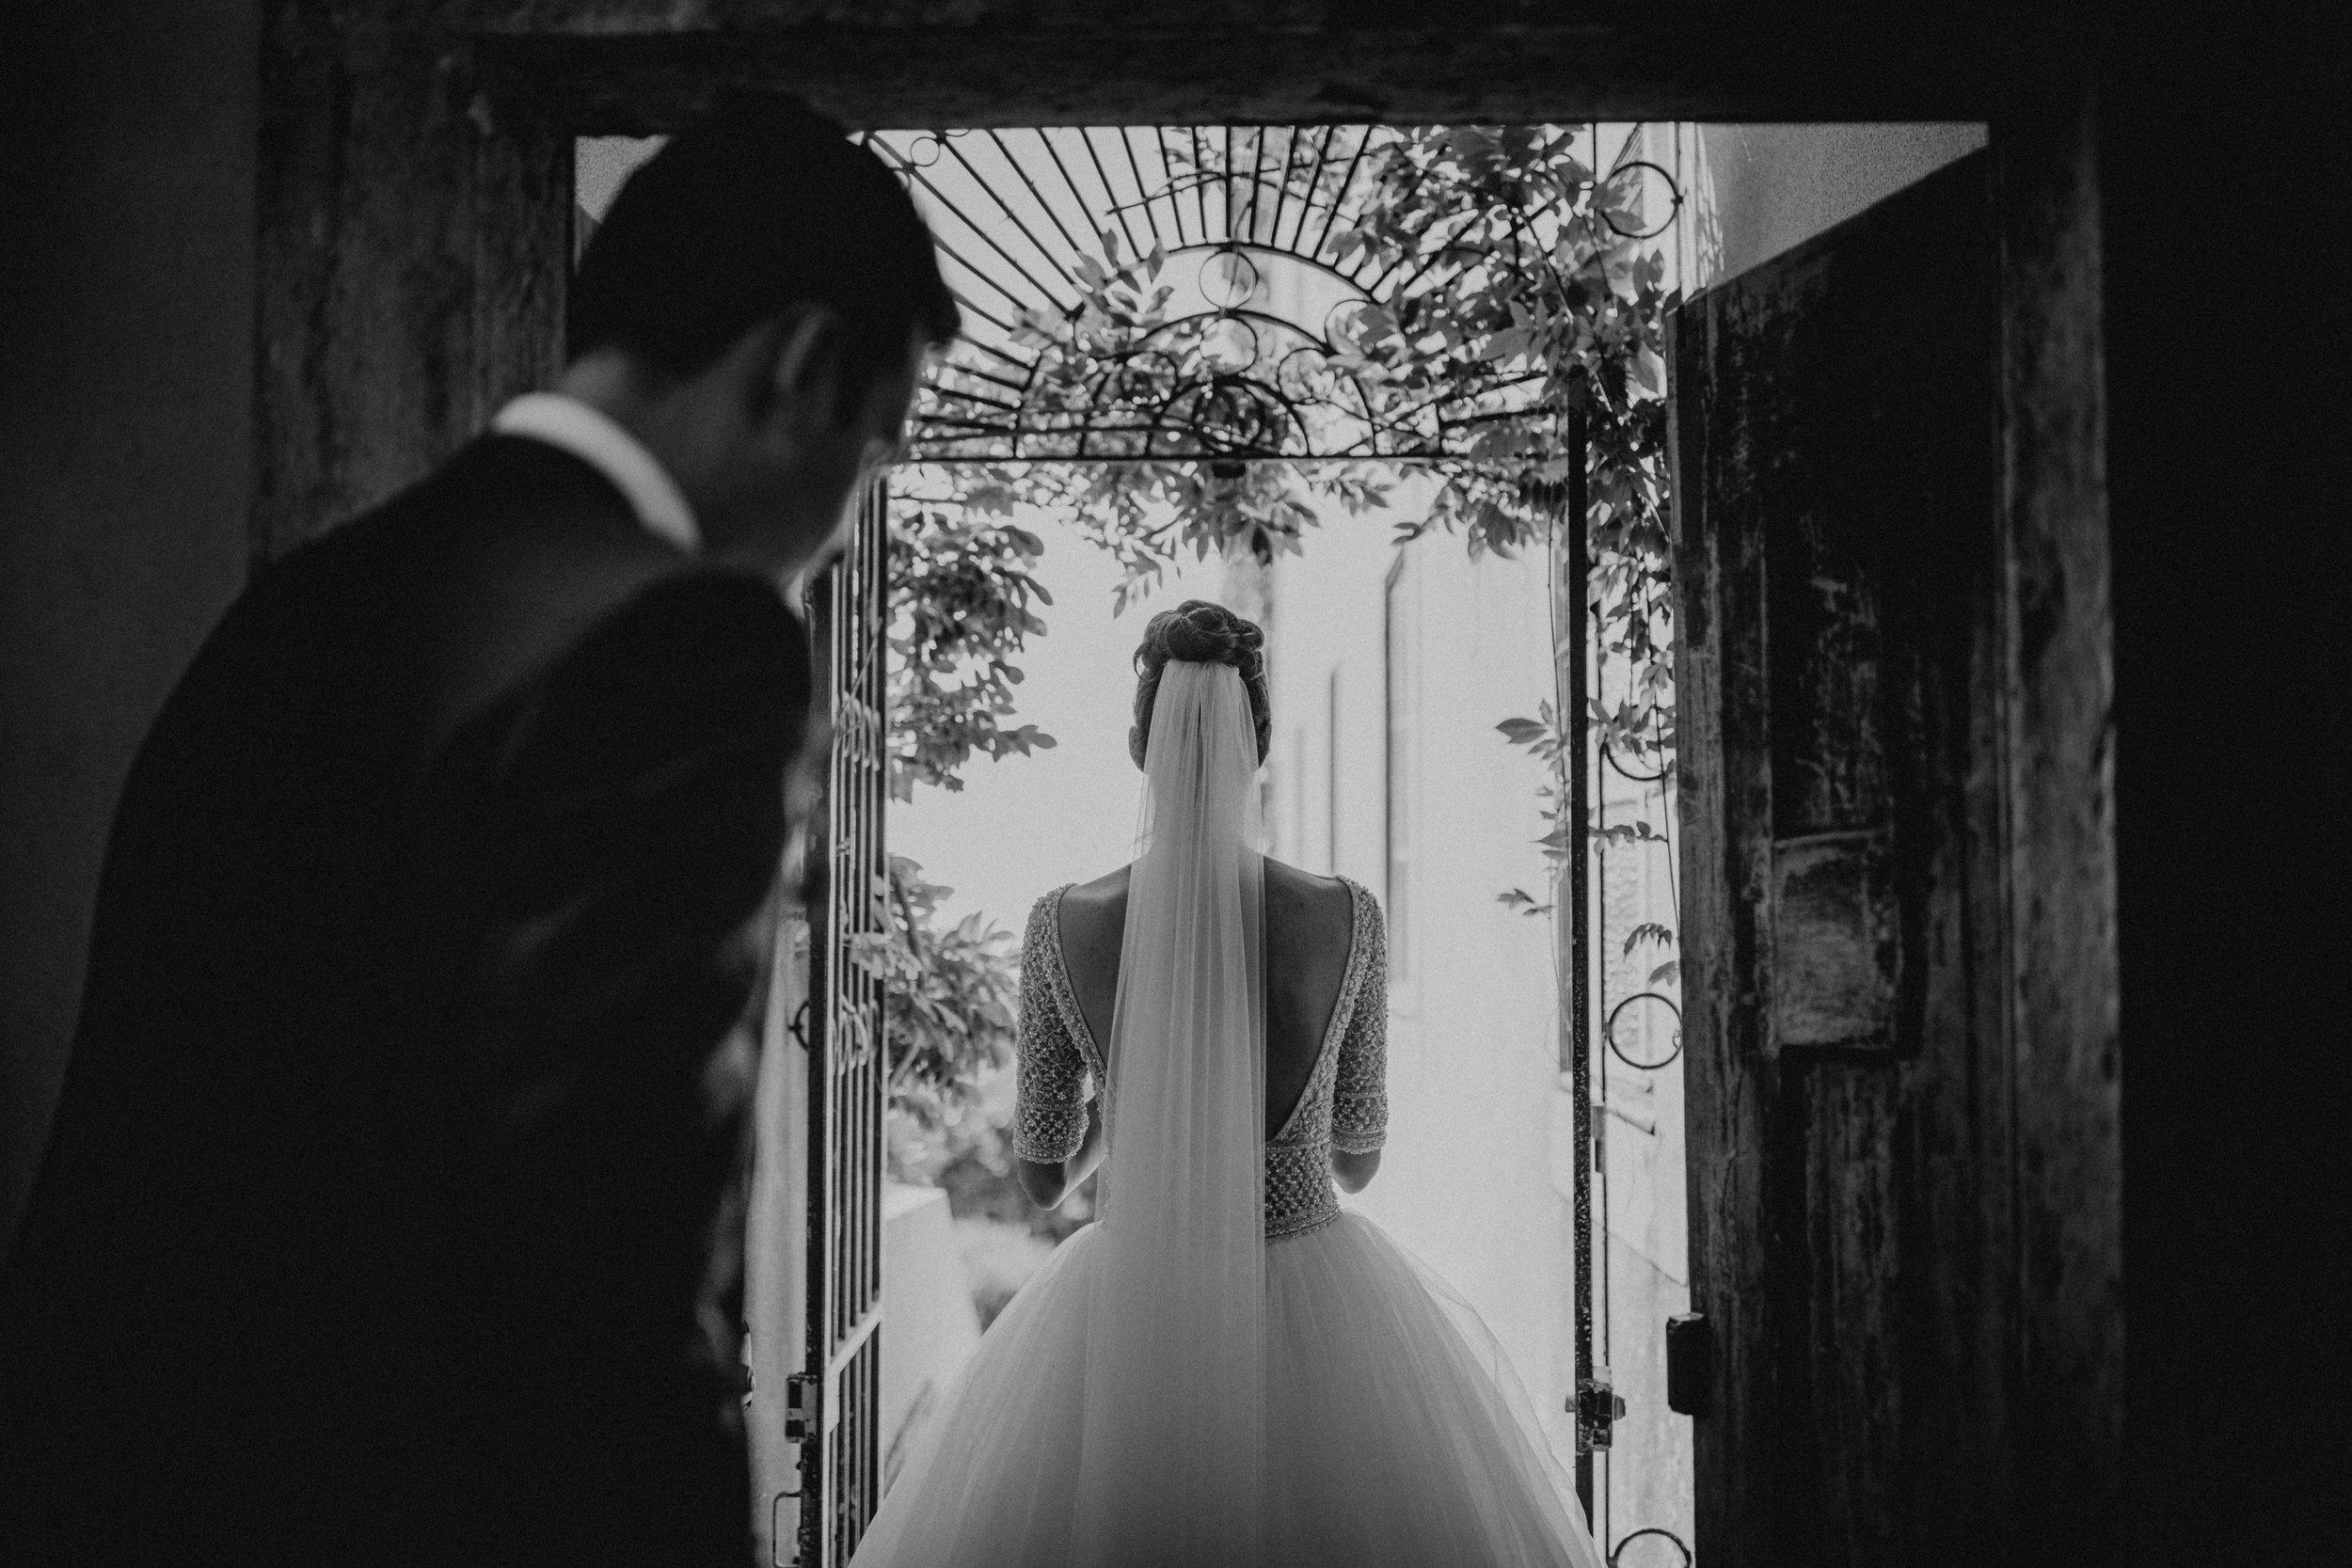 Lapela-photography-wedding-sintra-portugal-73.jpg